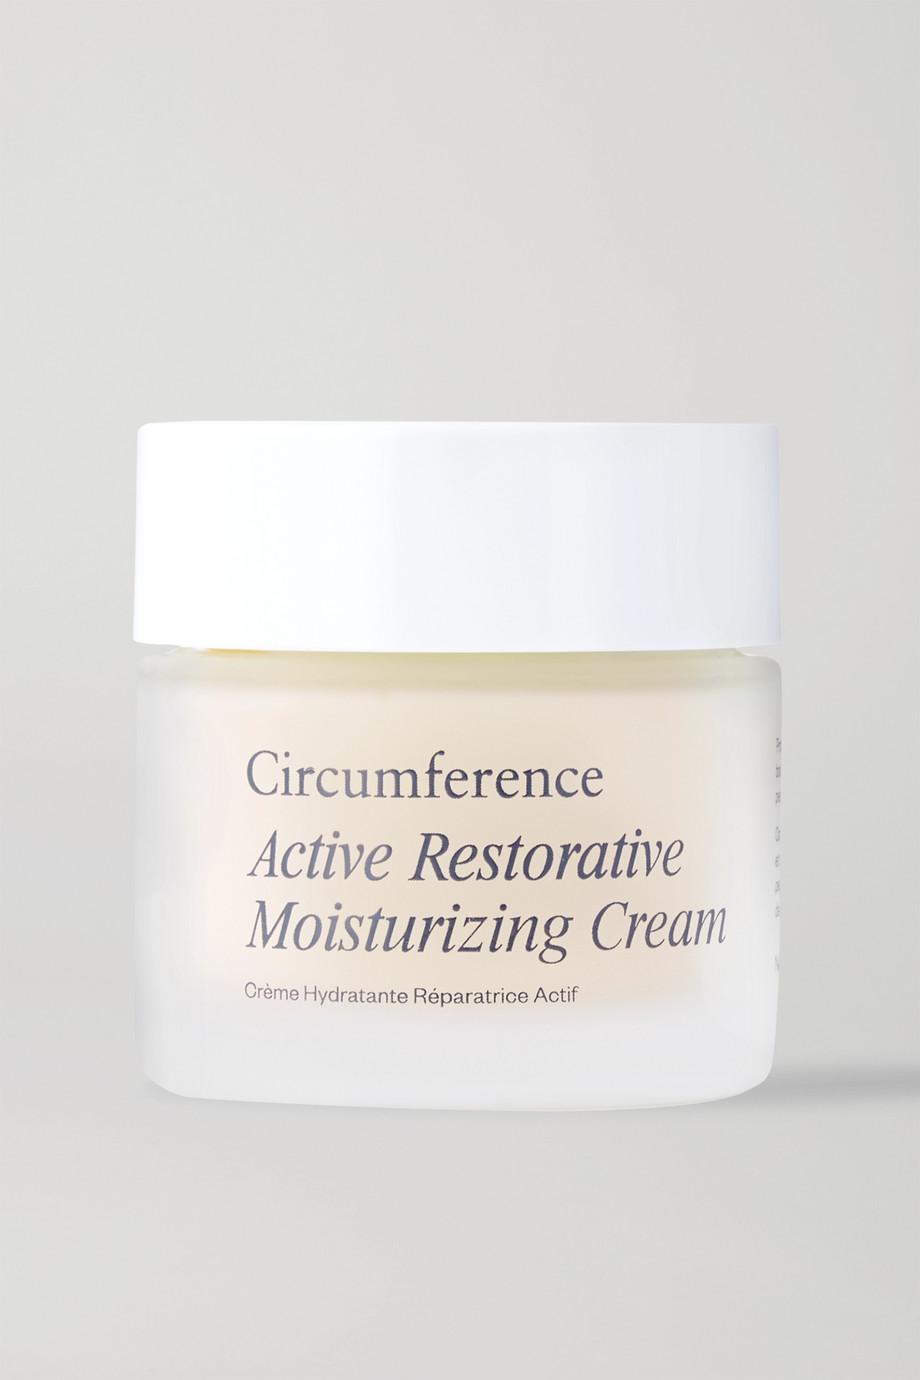 Circumference Active Restorative Moisturizing Cream, 60ml